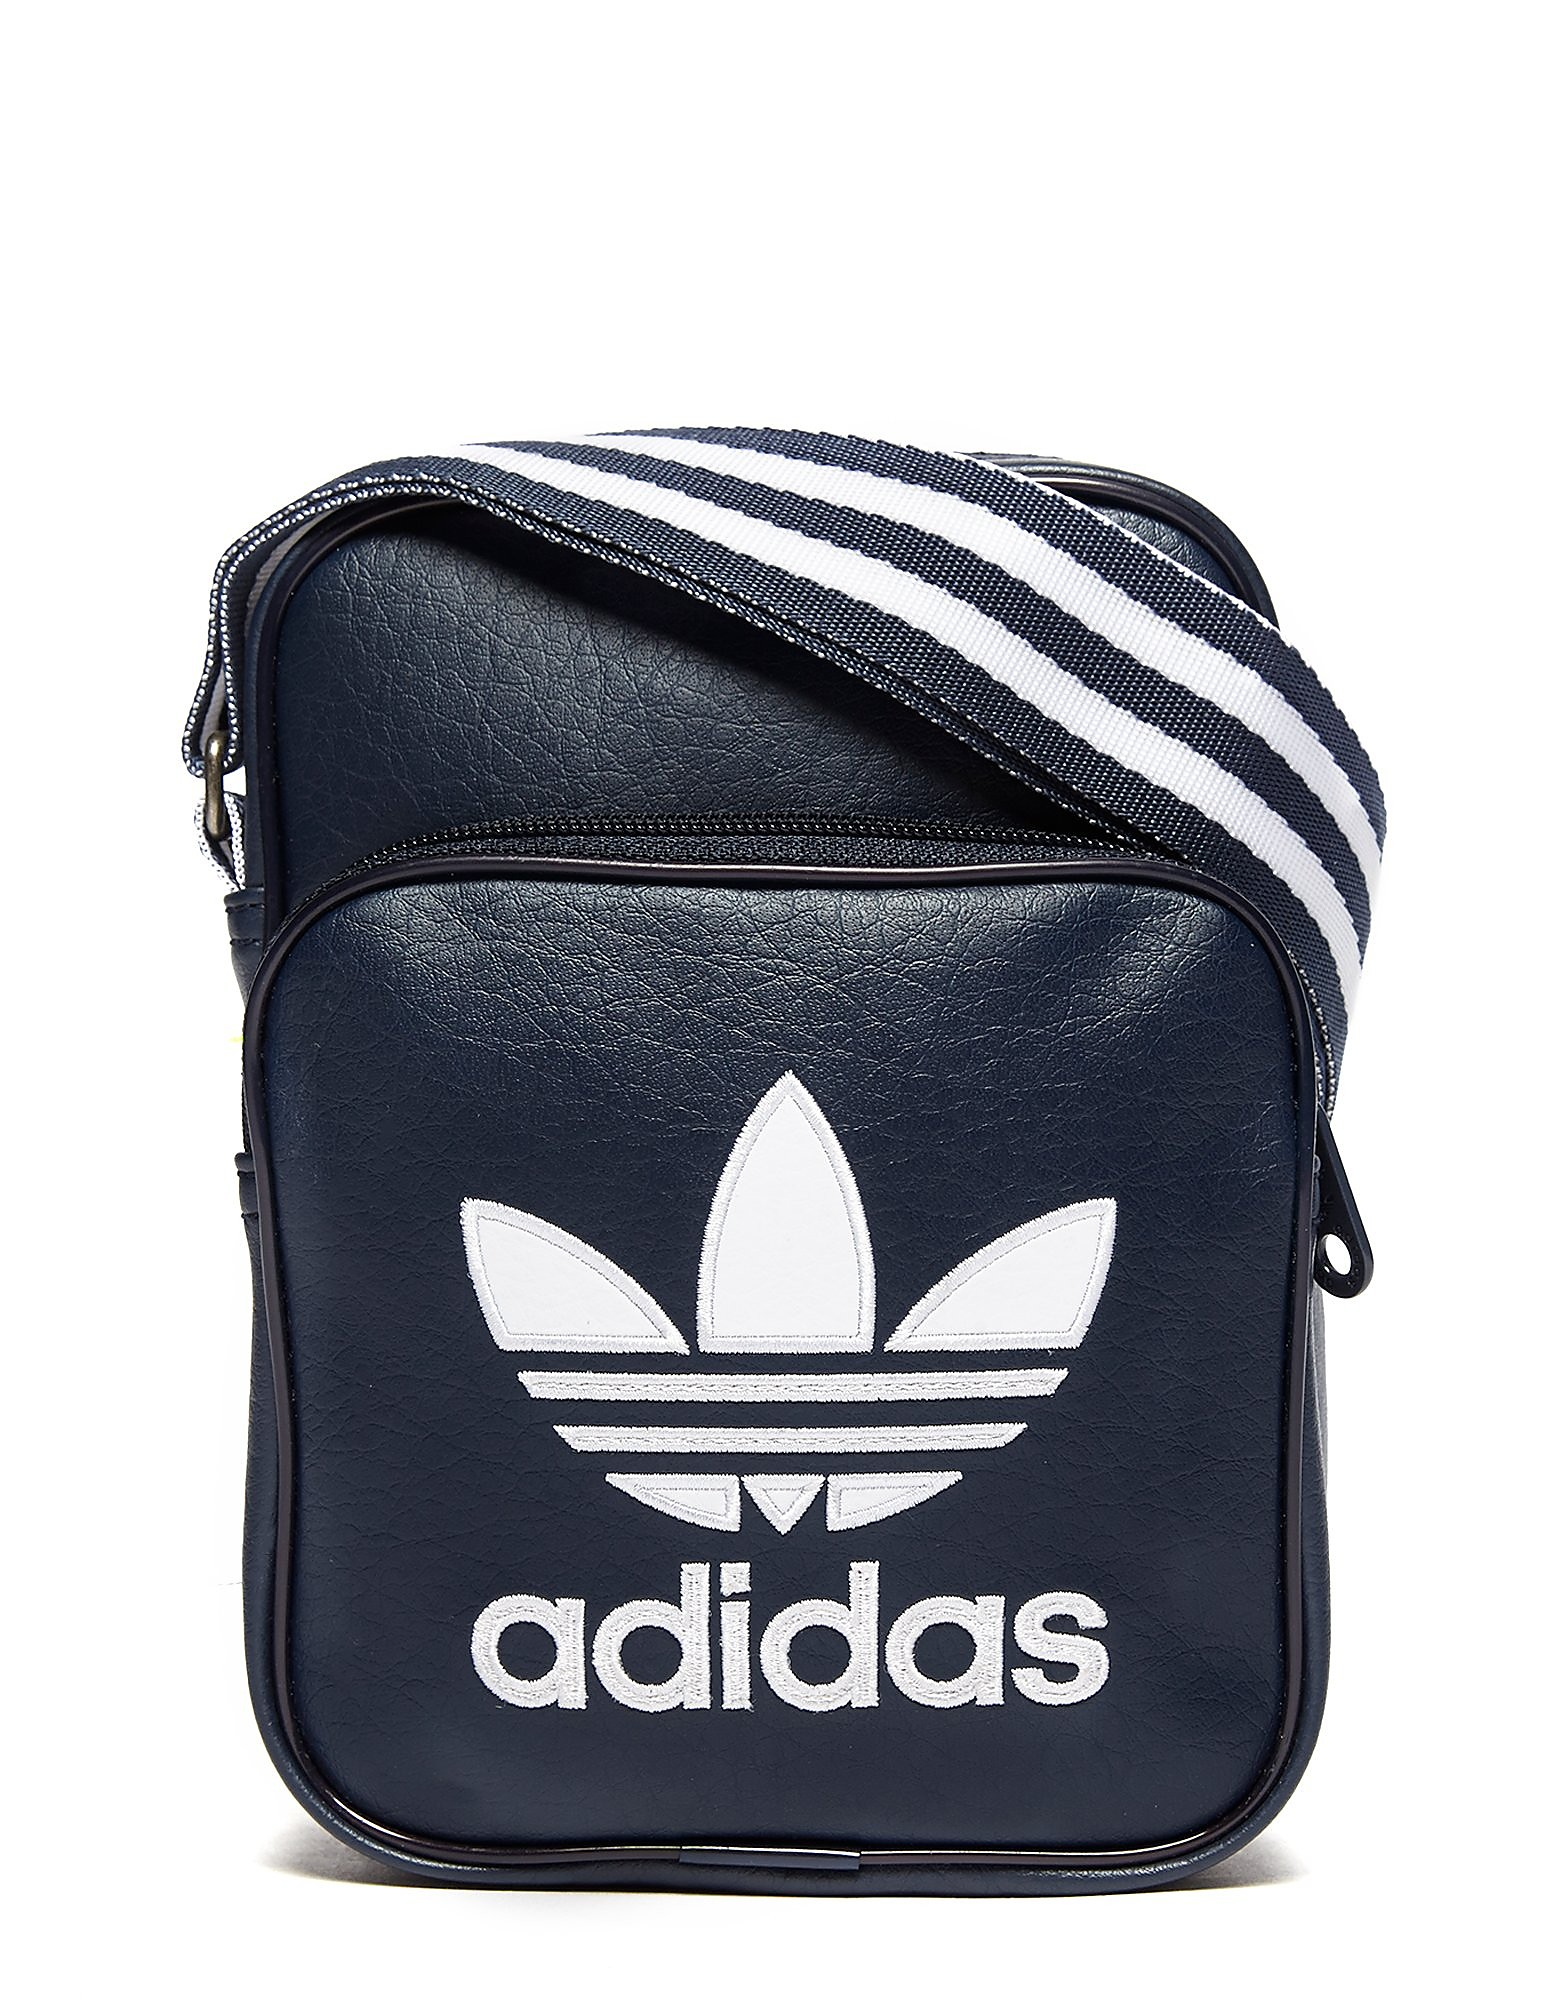 adidas Originals Small Items Tasche